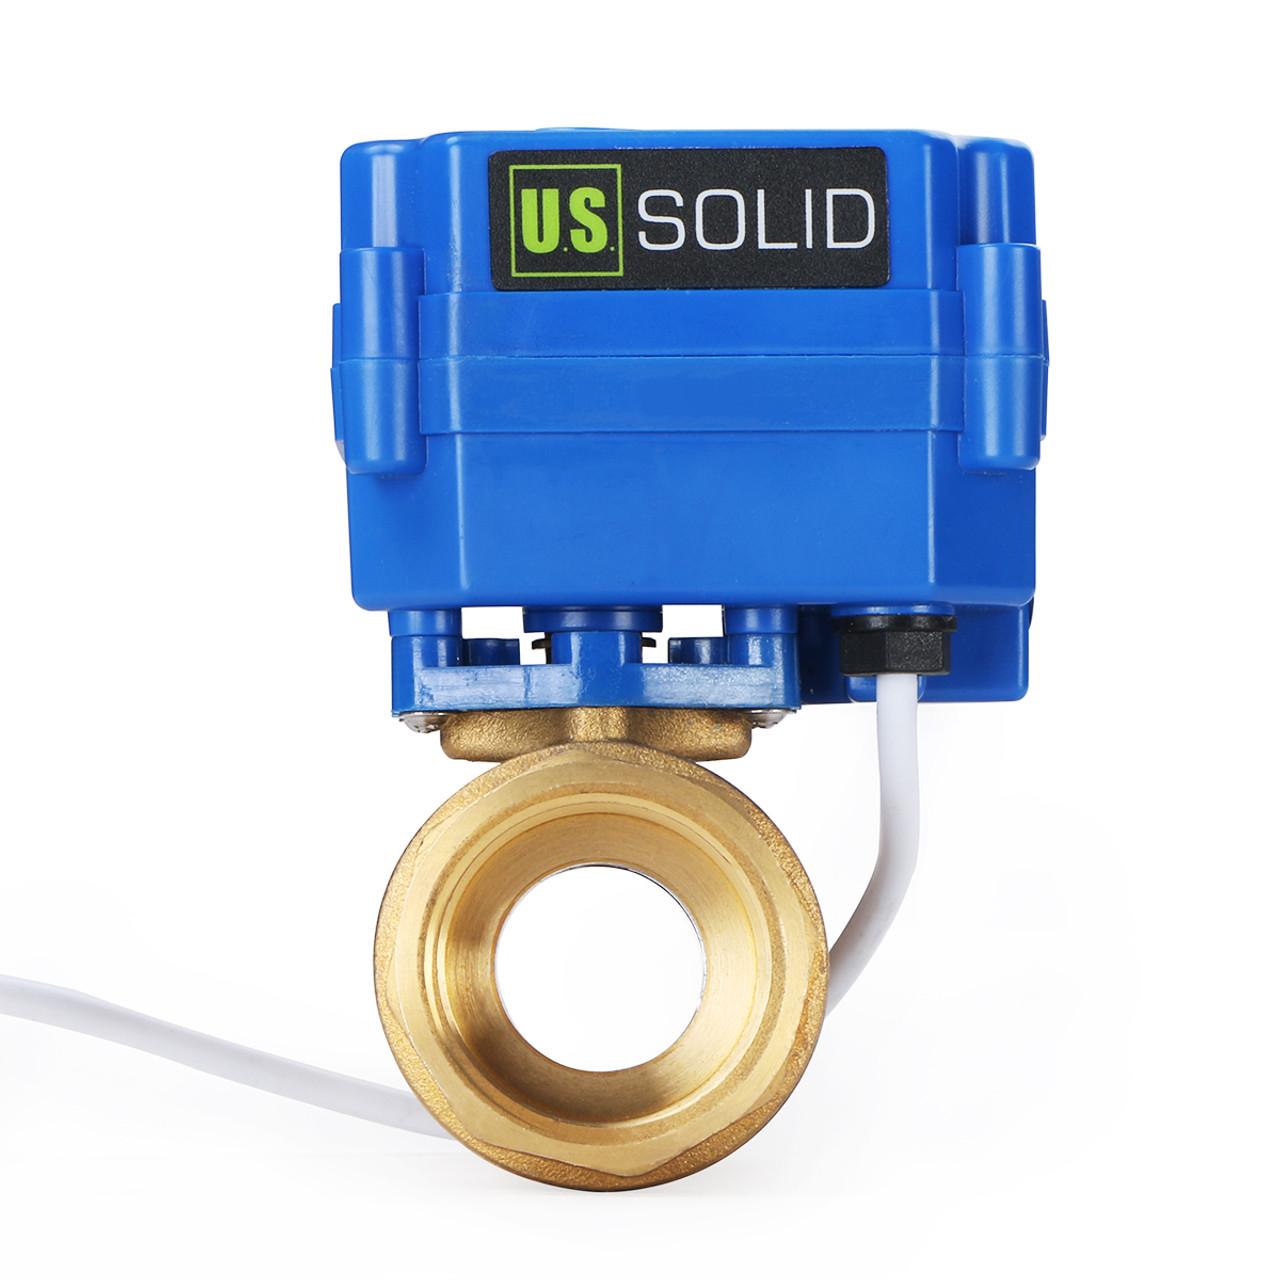 "USSOLID Motorized Ball Valve- 1"" Brass Electrical Ball Valve with Standard Port, 9-24 V AC/DC, 3 Wire Setup"